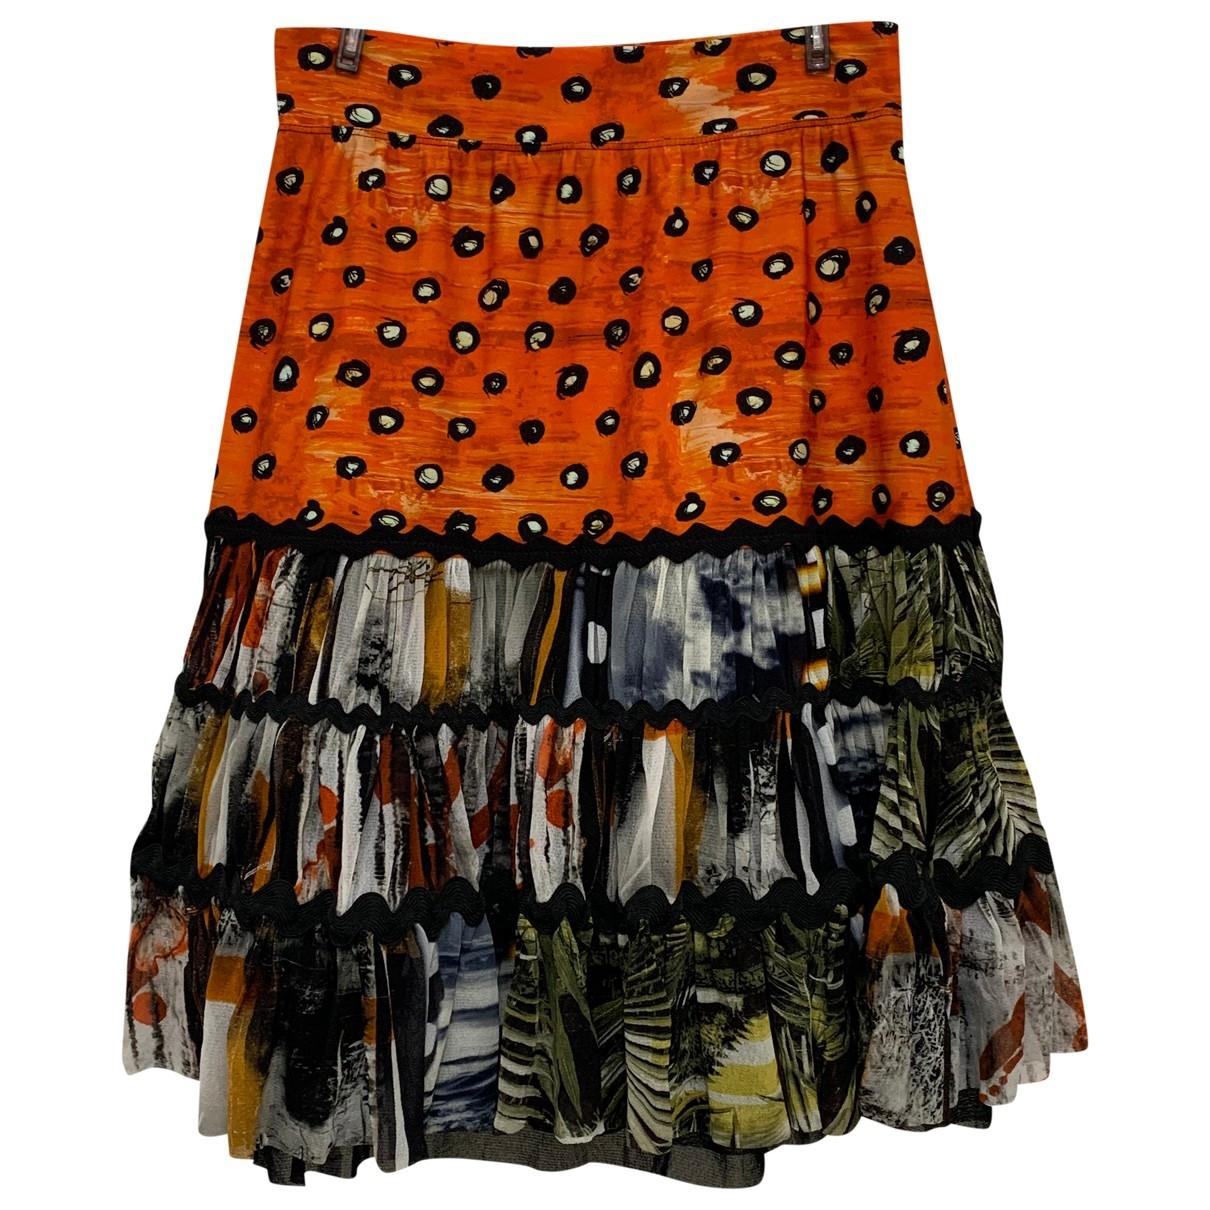 Jean Paul Gaultier - Jupe   pour femme - multicolore